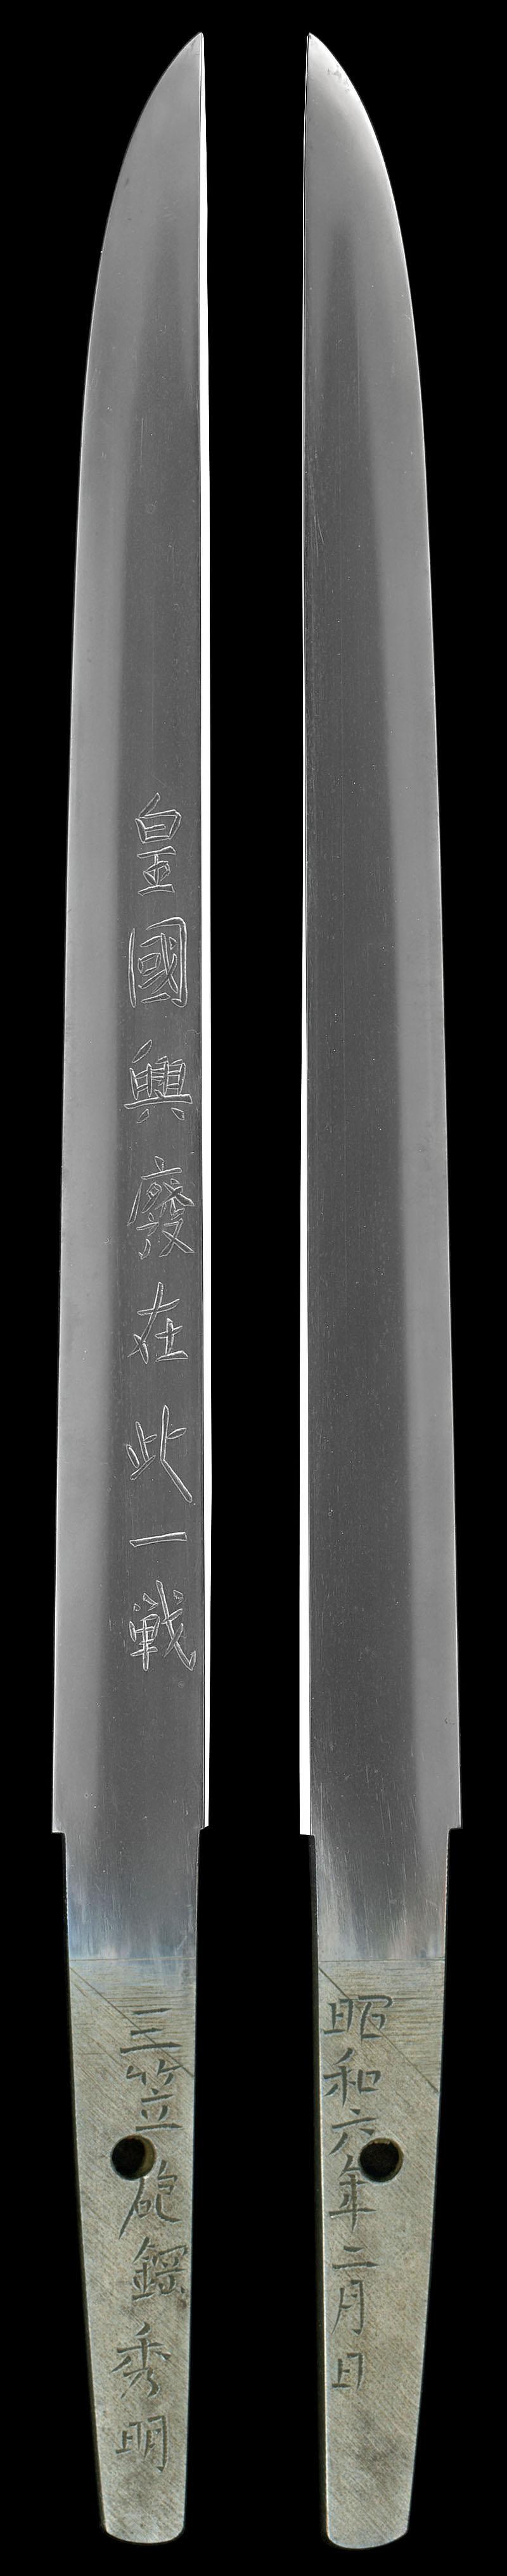 三笠砲鋼 秀明作(堀井秀明)Picture of whole